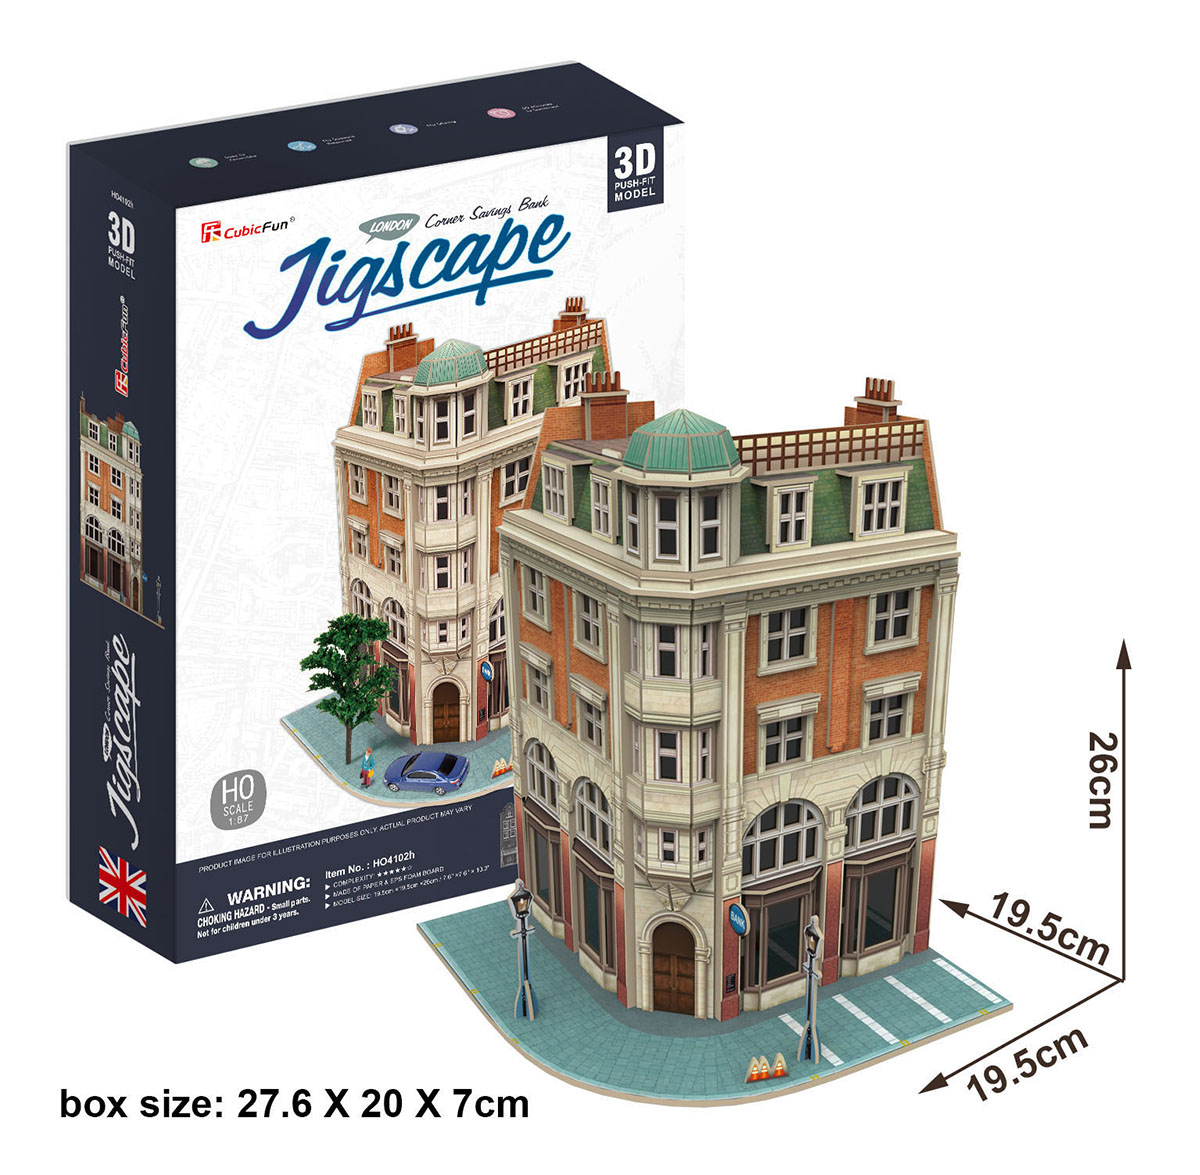 Corner Savings Bank Landmarks / Monuments Jigsaw Puzzle